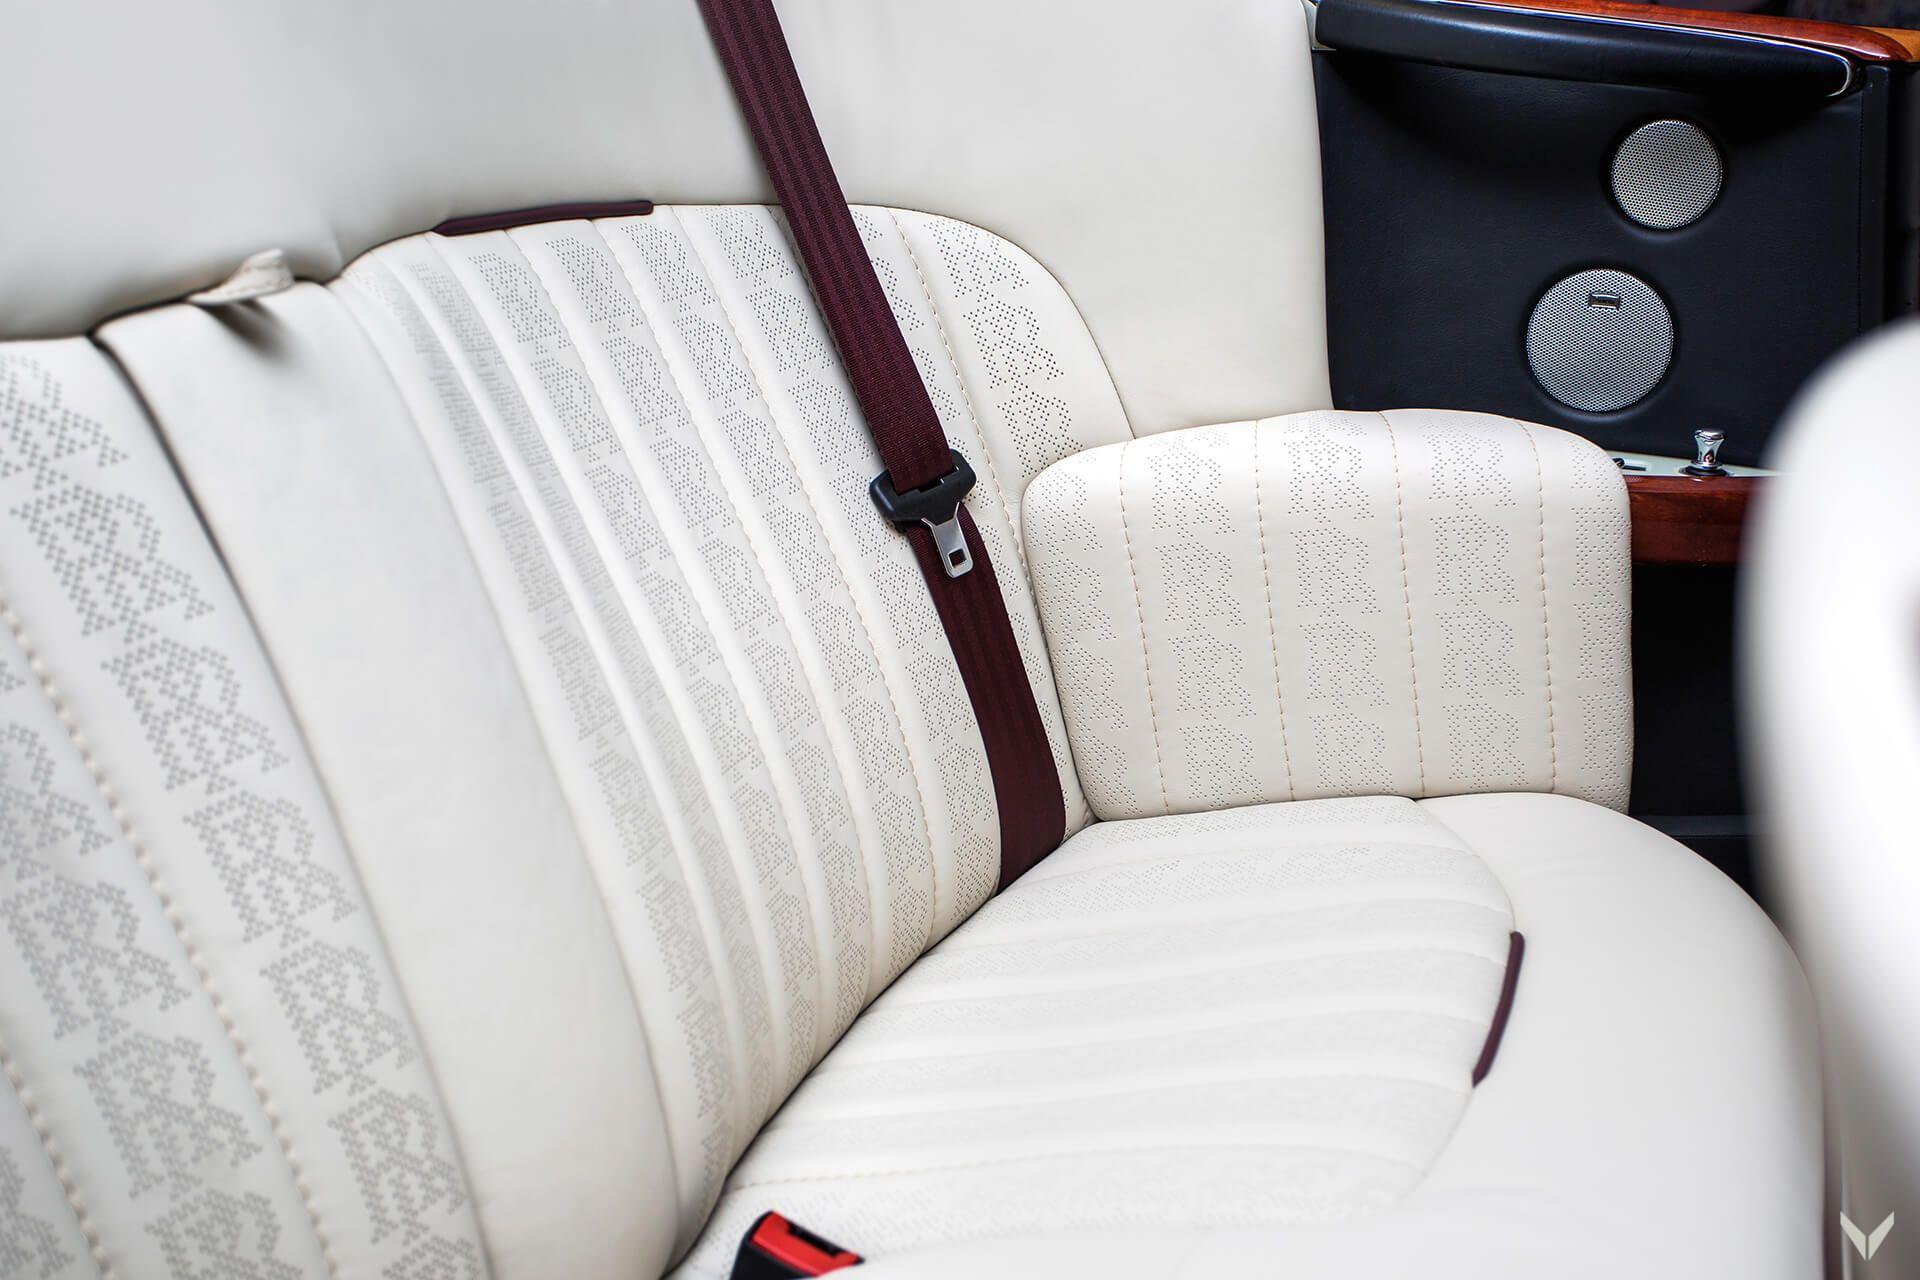 Rolls-Royce_Phantom_Drophead_Coupe_By_Vilner_0010